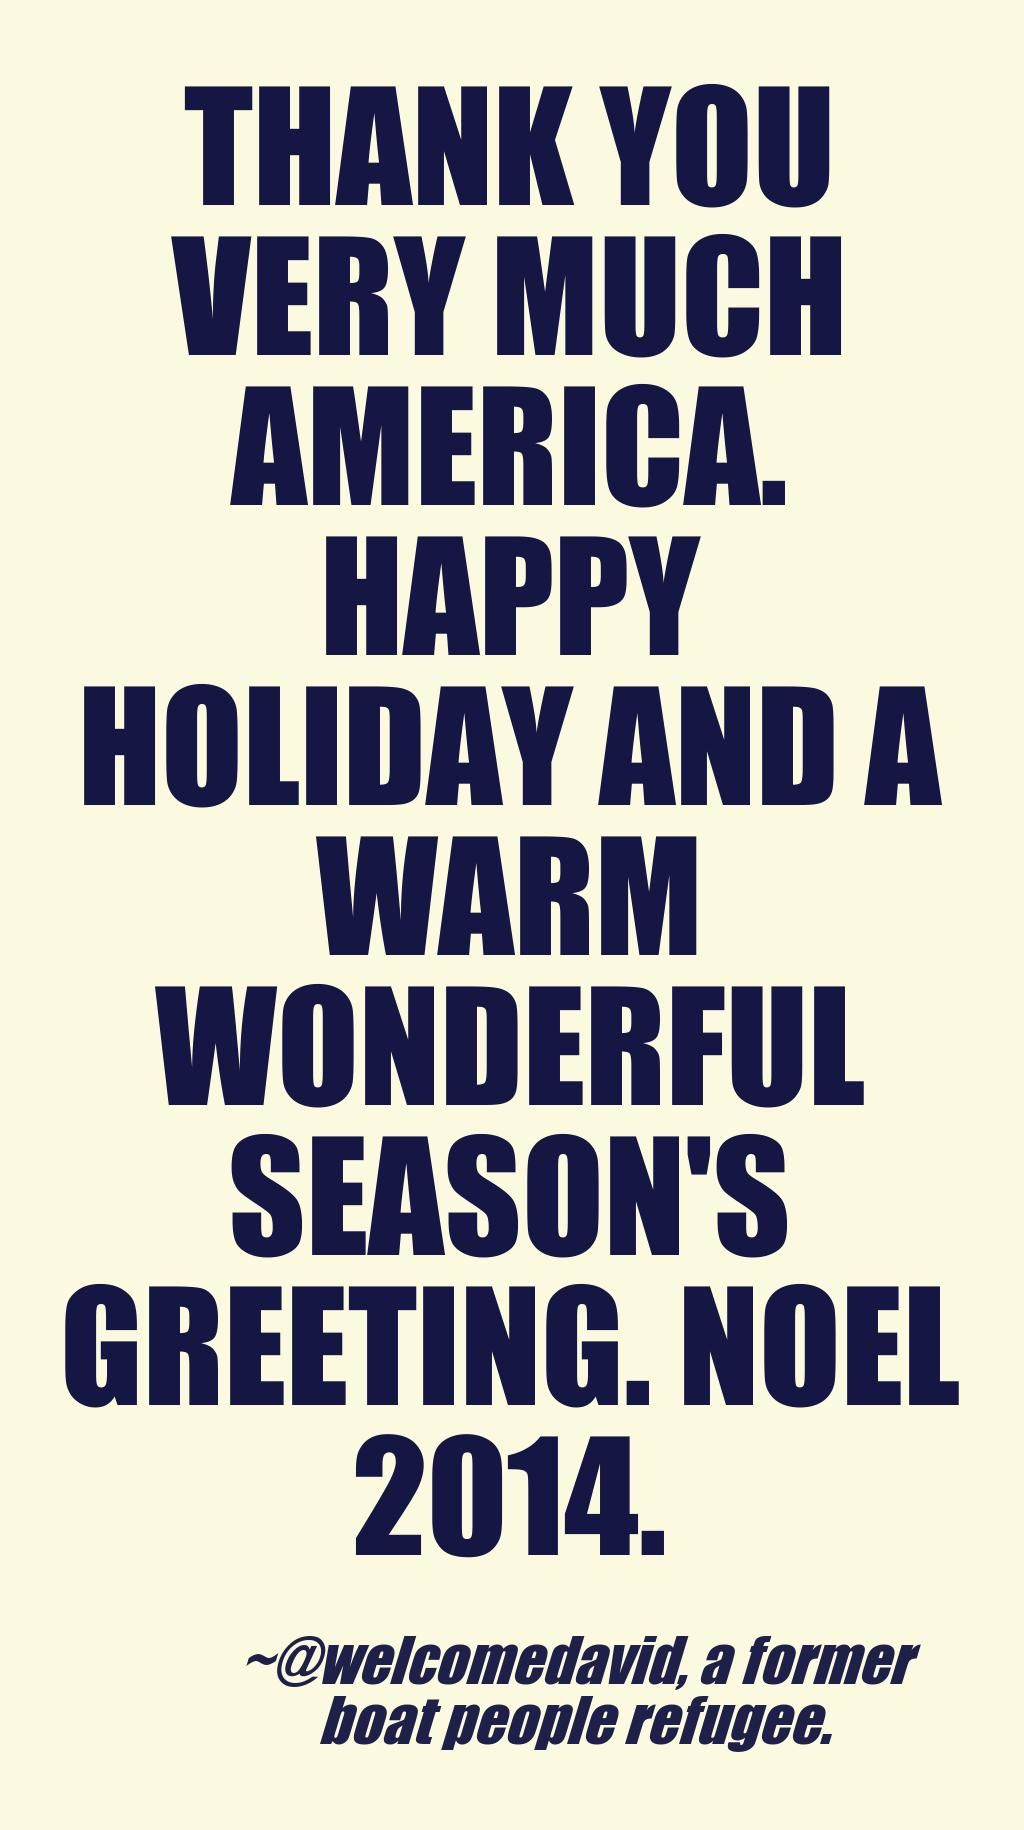 Thank you america happy holiday noel 2014 seasons greeting from a thank you america happy holiday noel 2014 seasons greeting from a former boat people kristyandbryce Images